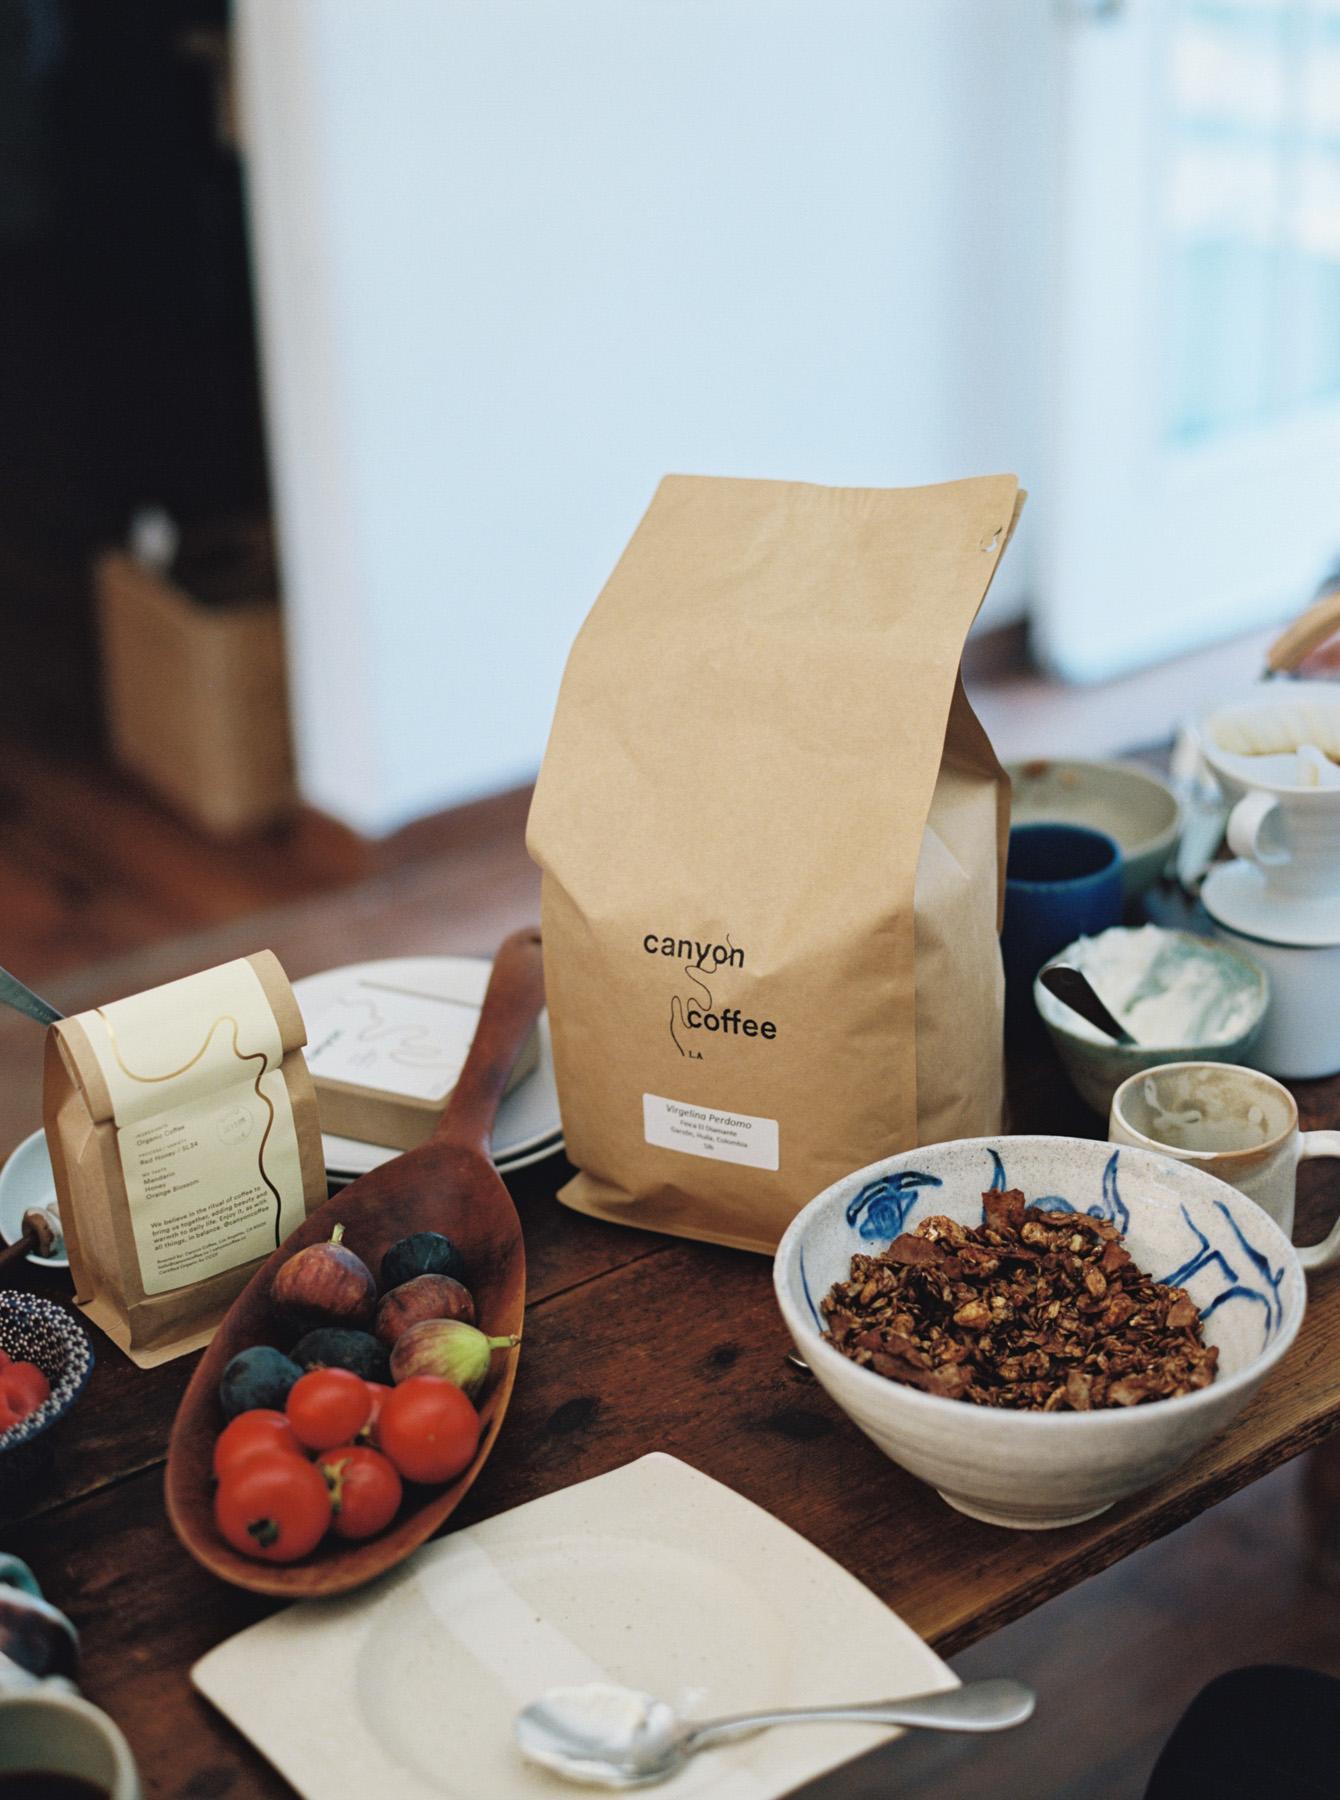 Canyon Coffee, Justin Chung, Morning Rituals